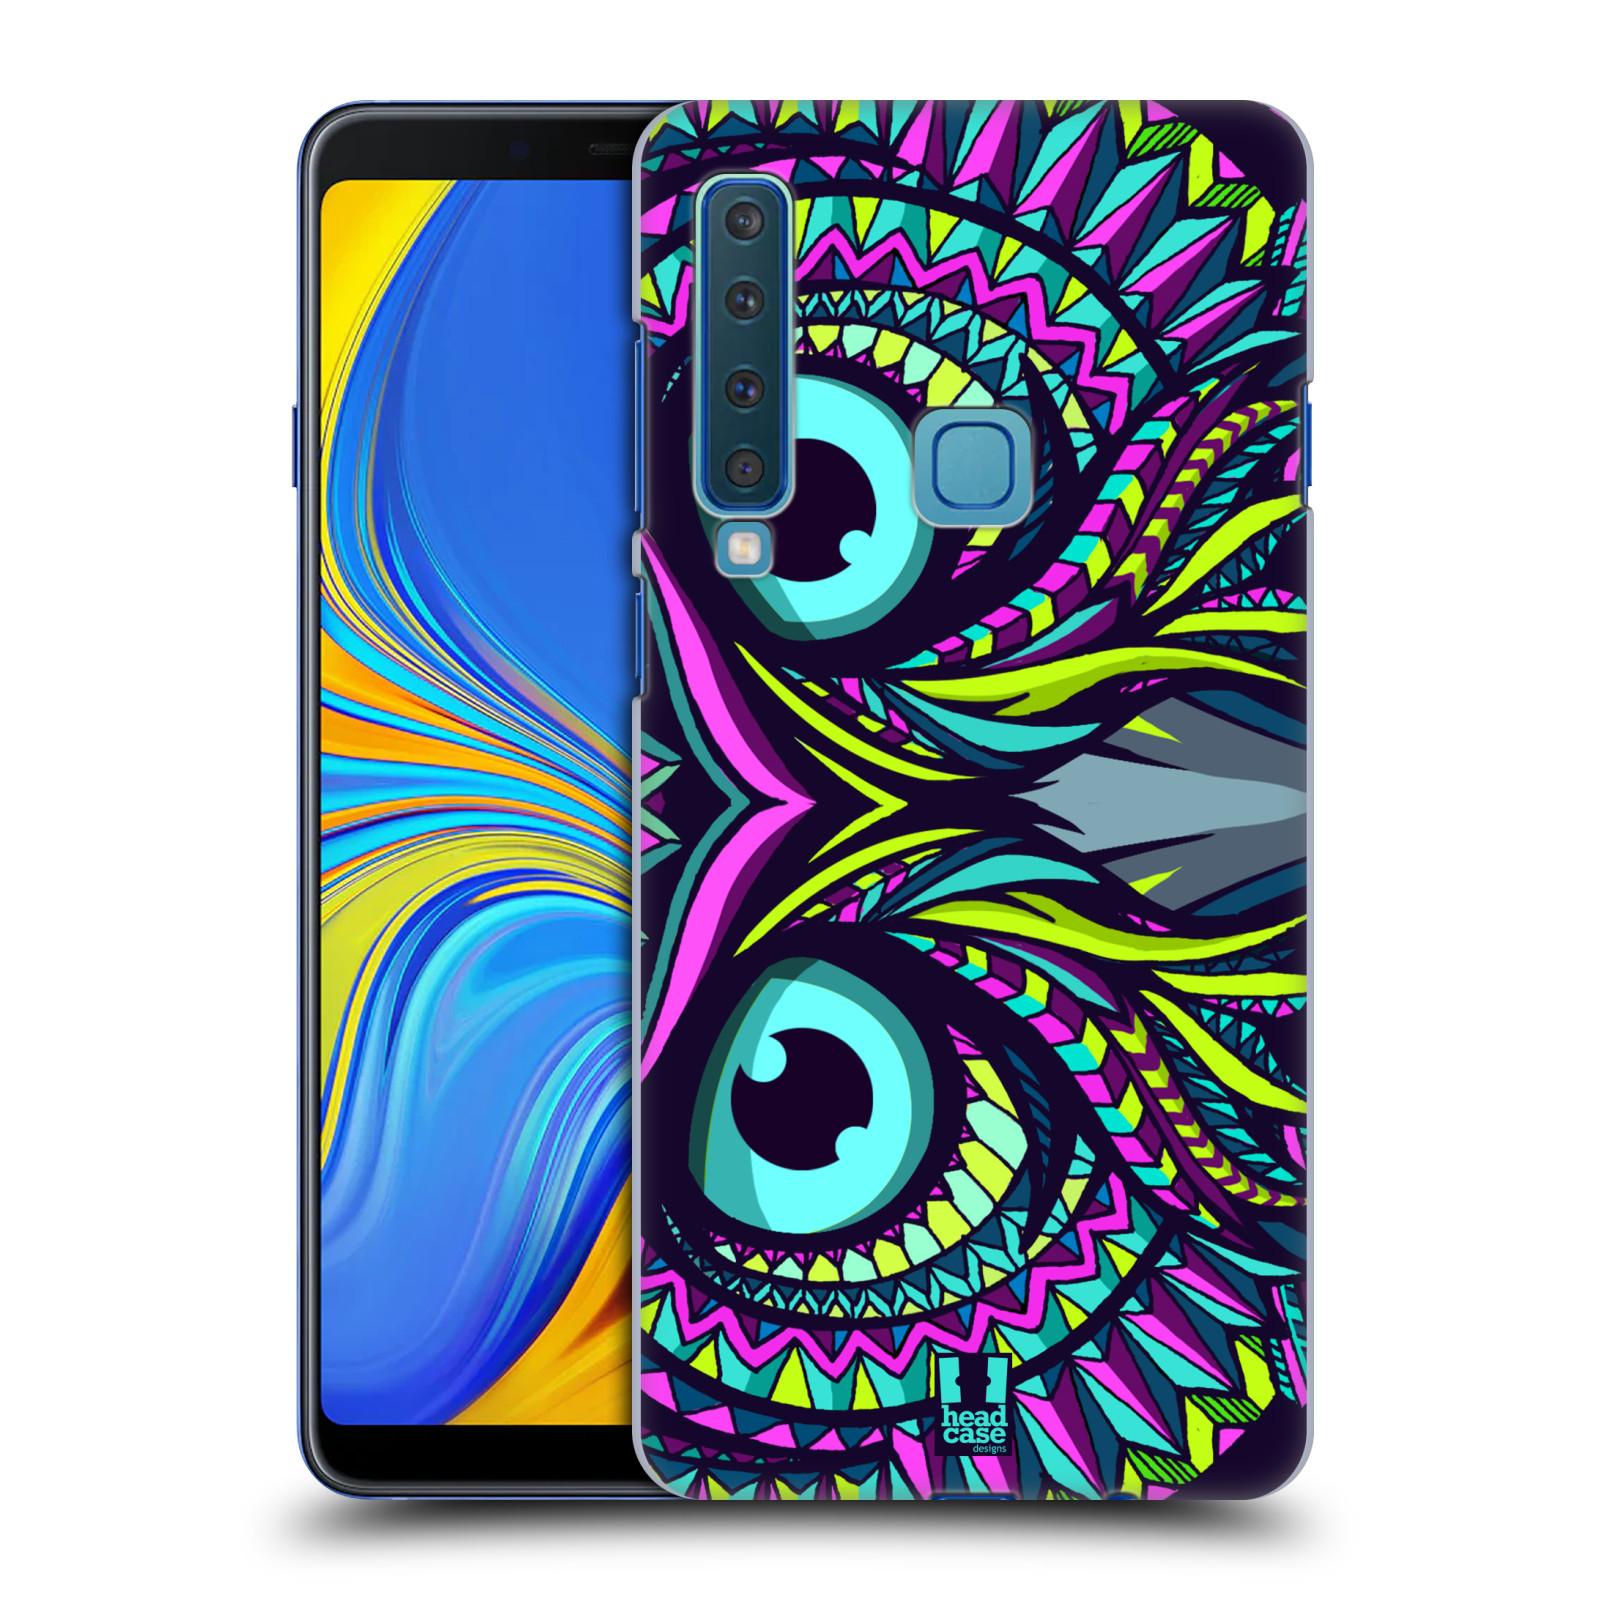 Plastové pouzdro na mobil Samsung Galaxy A9 (2018) - Head Case - AZTEC SOVA